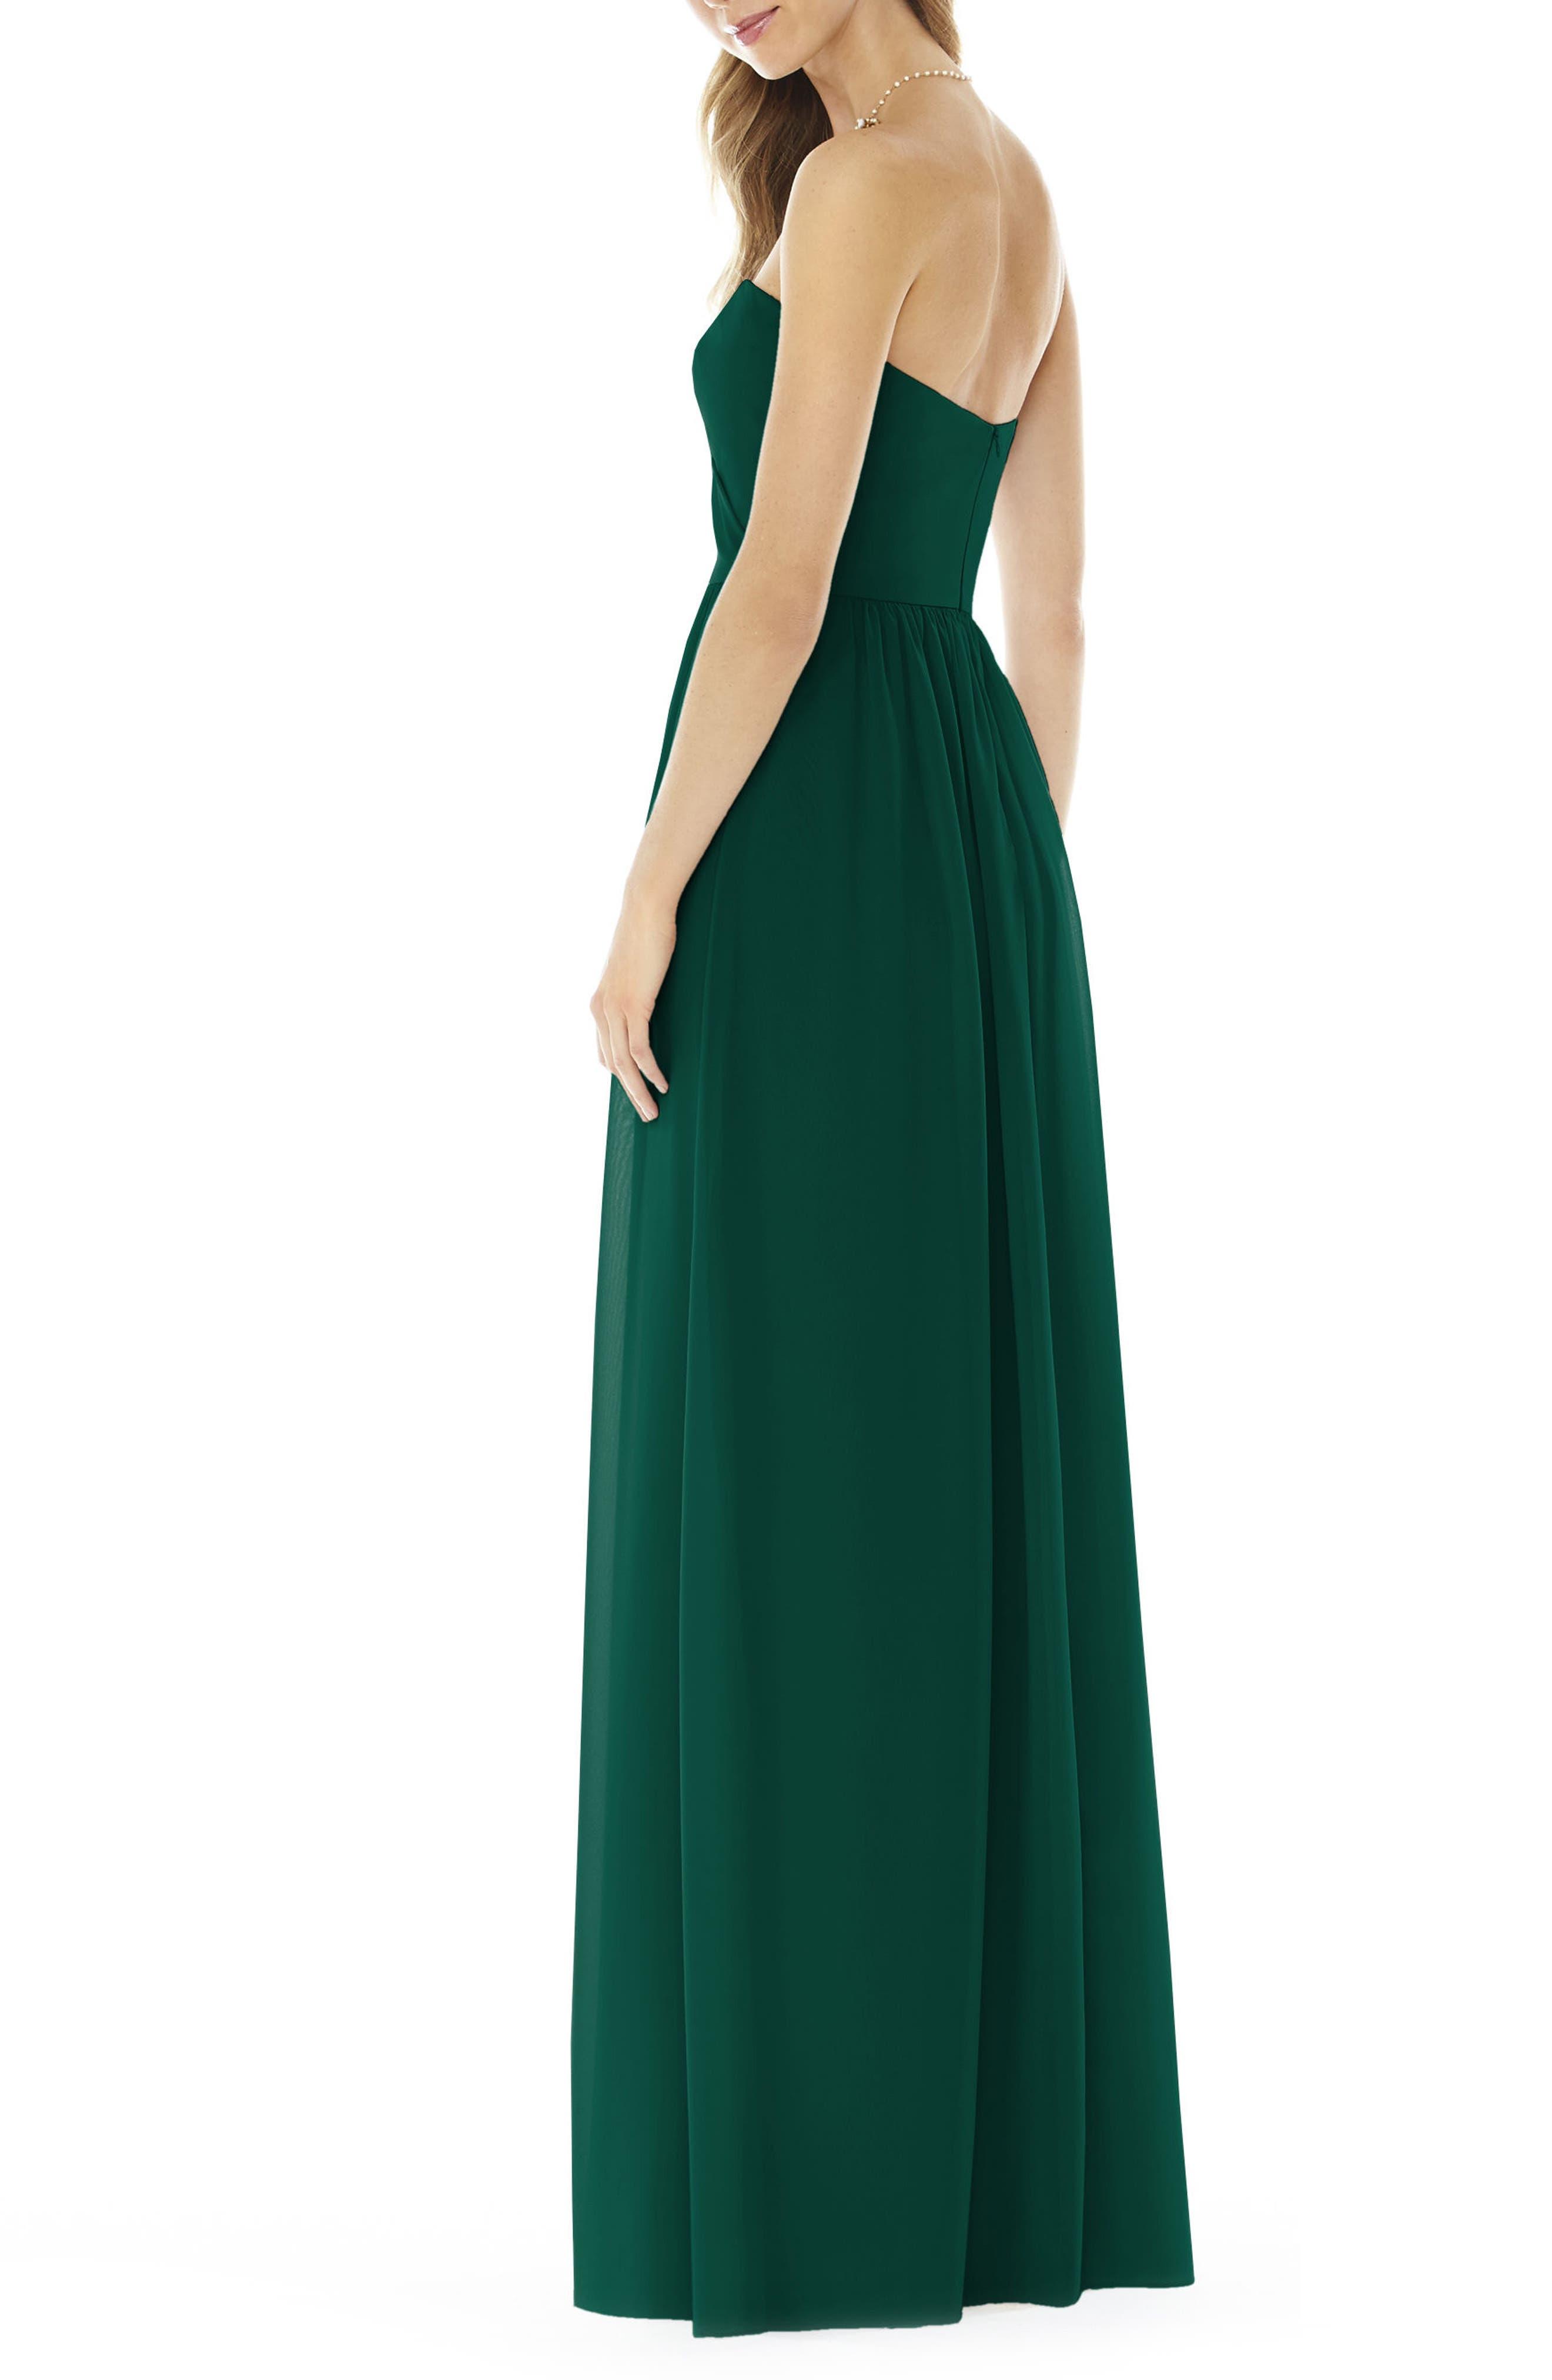 a808bdc289db Women's Sweetheart Dresses | Nordstrom